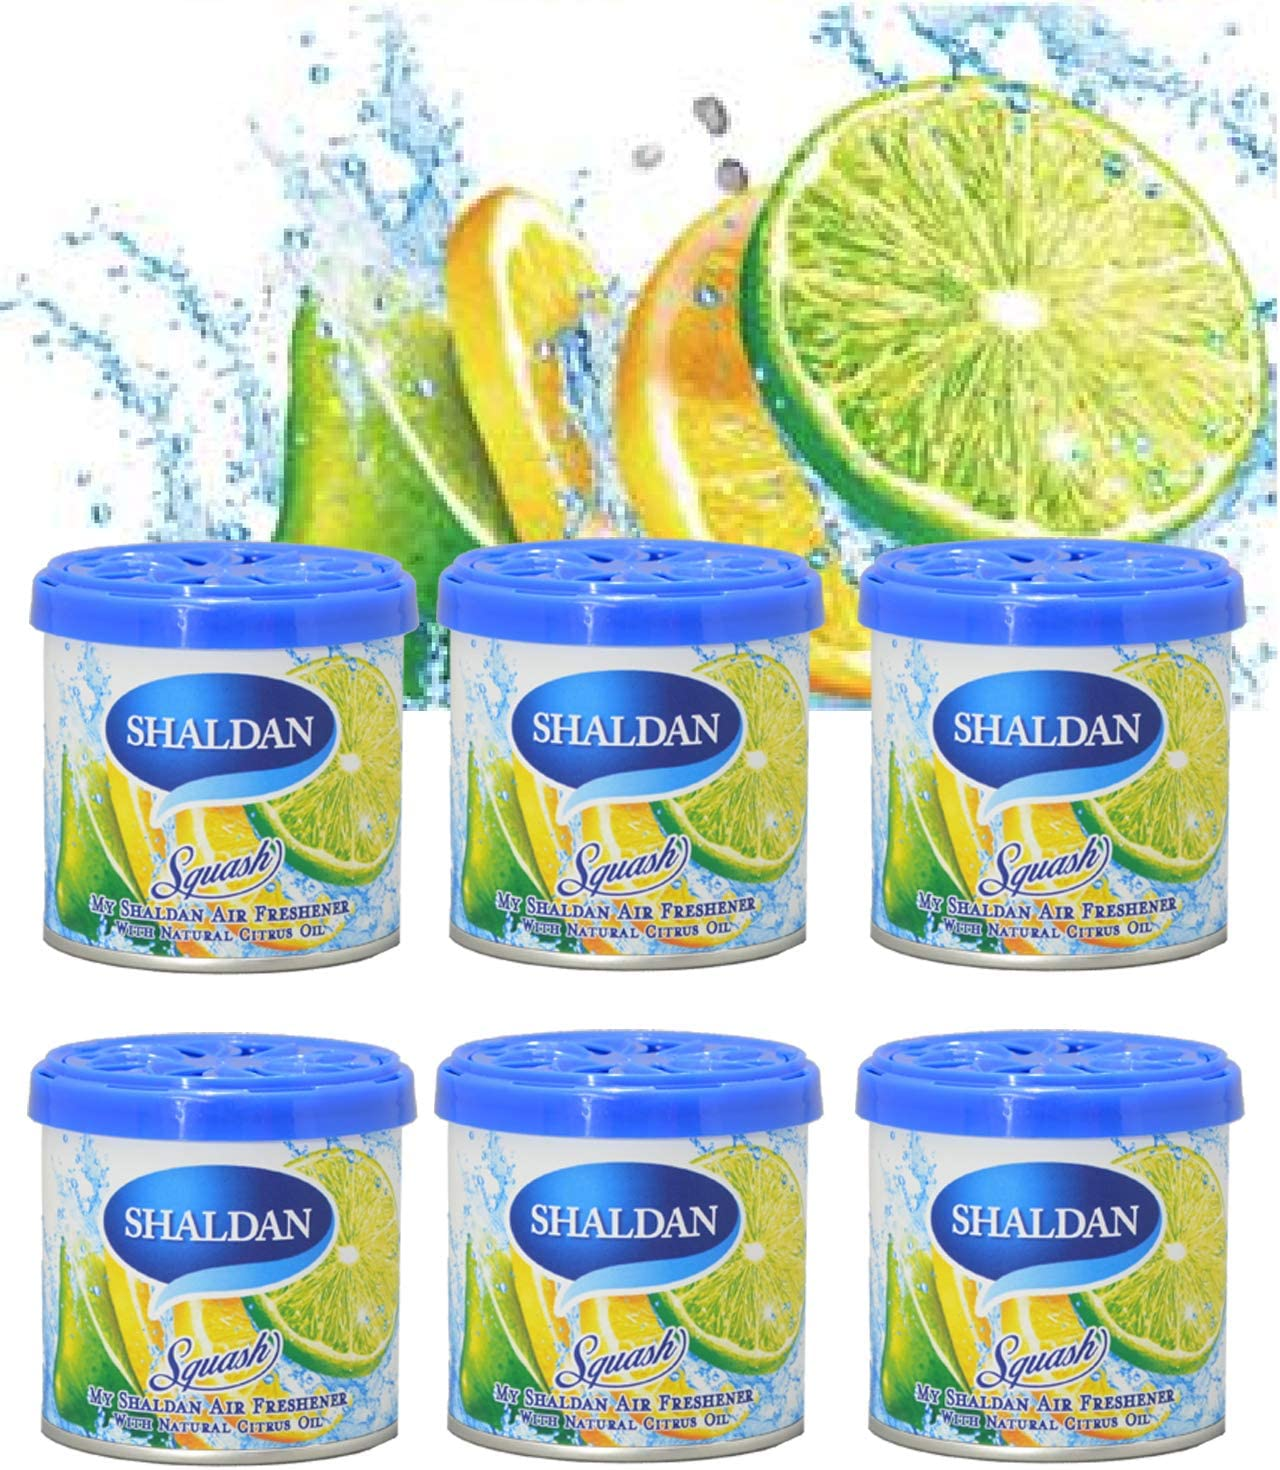 My Shaldan Air Freshener Squash Scent (D41SQ) - QTY. 6 Cans by MY SHALDAN CLASSIC AIR FRESHENER